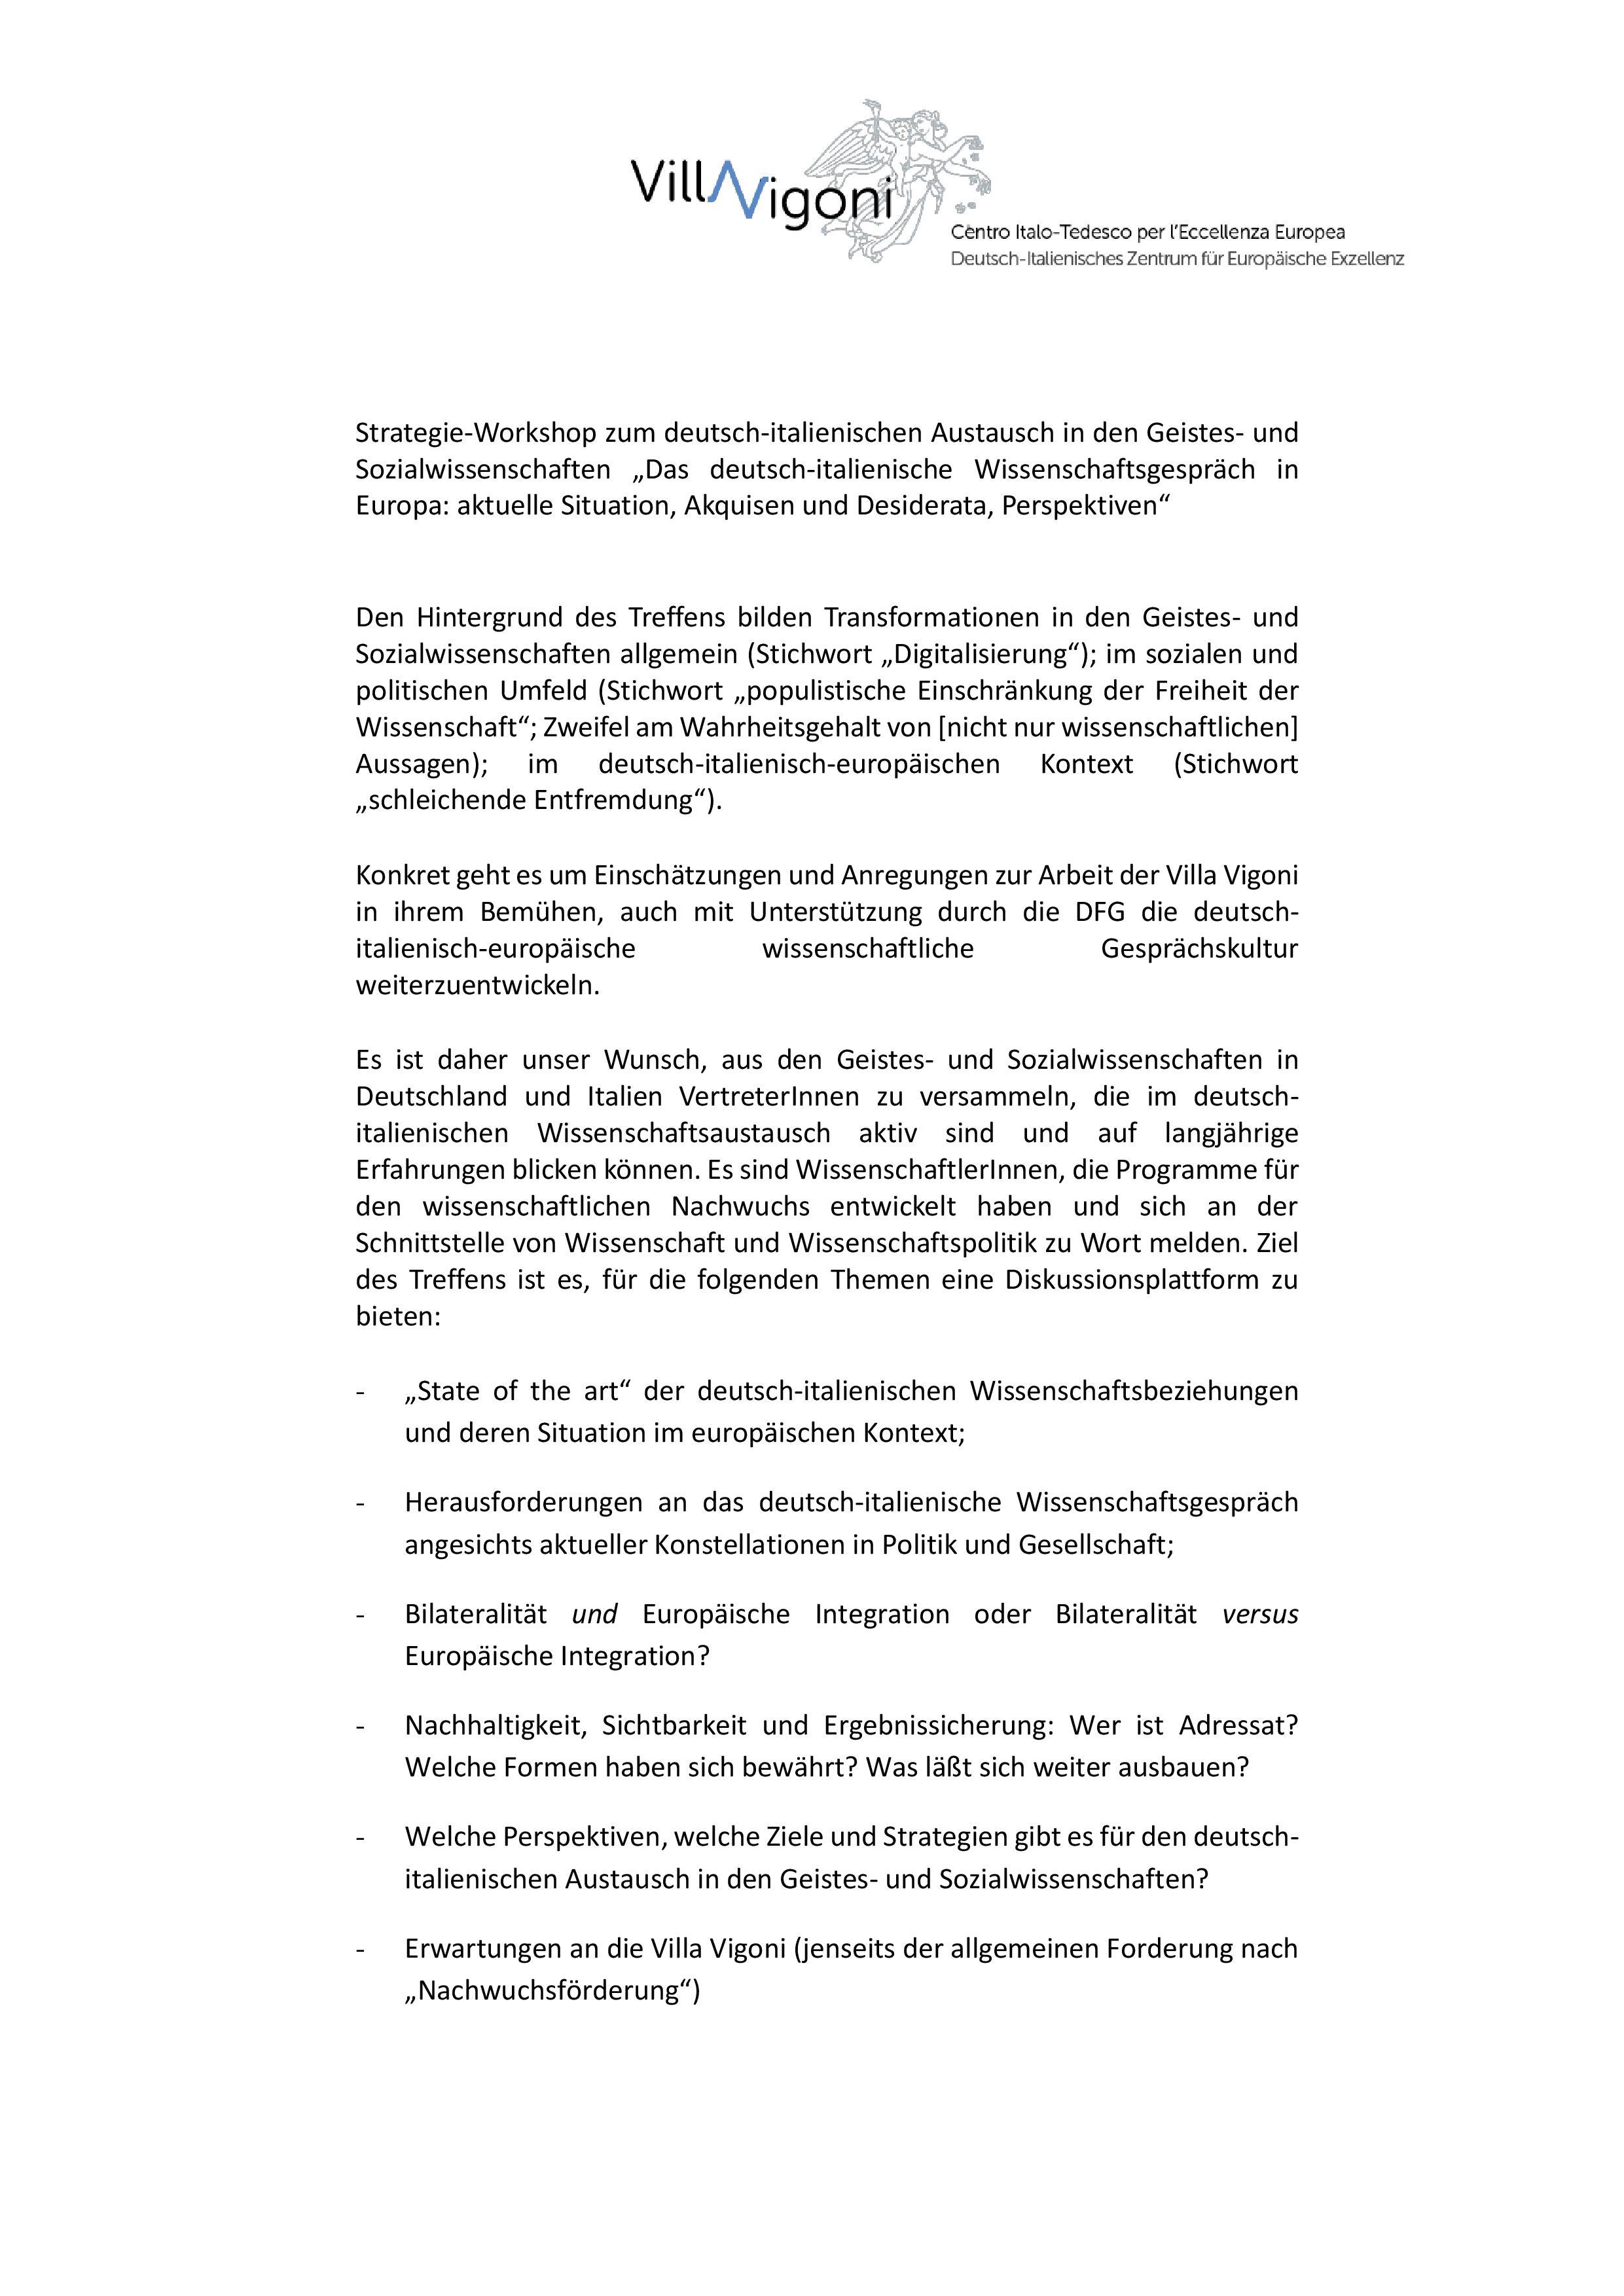 Programm-Workshop_06-06-2019-1-page-001